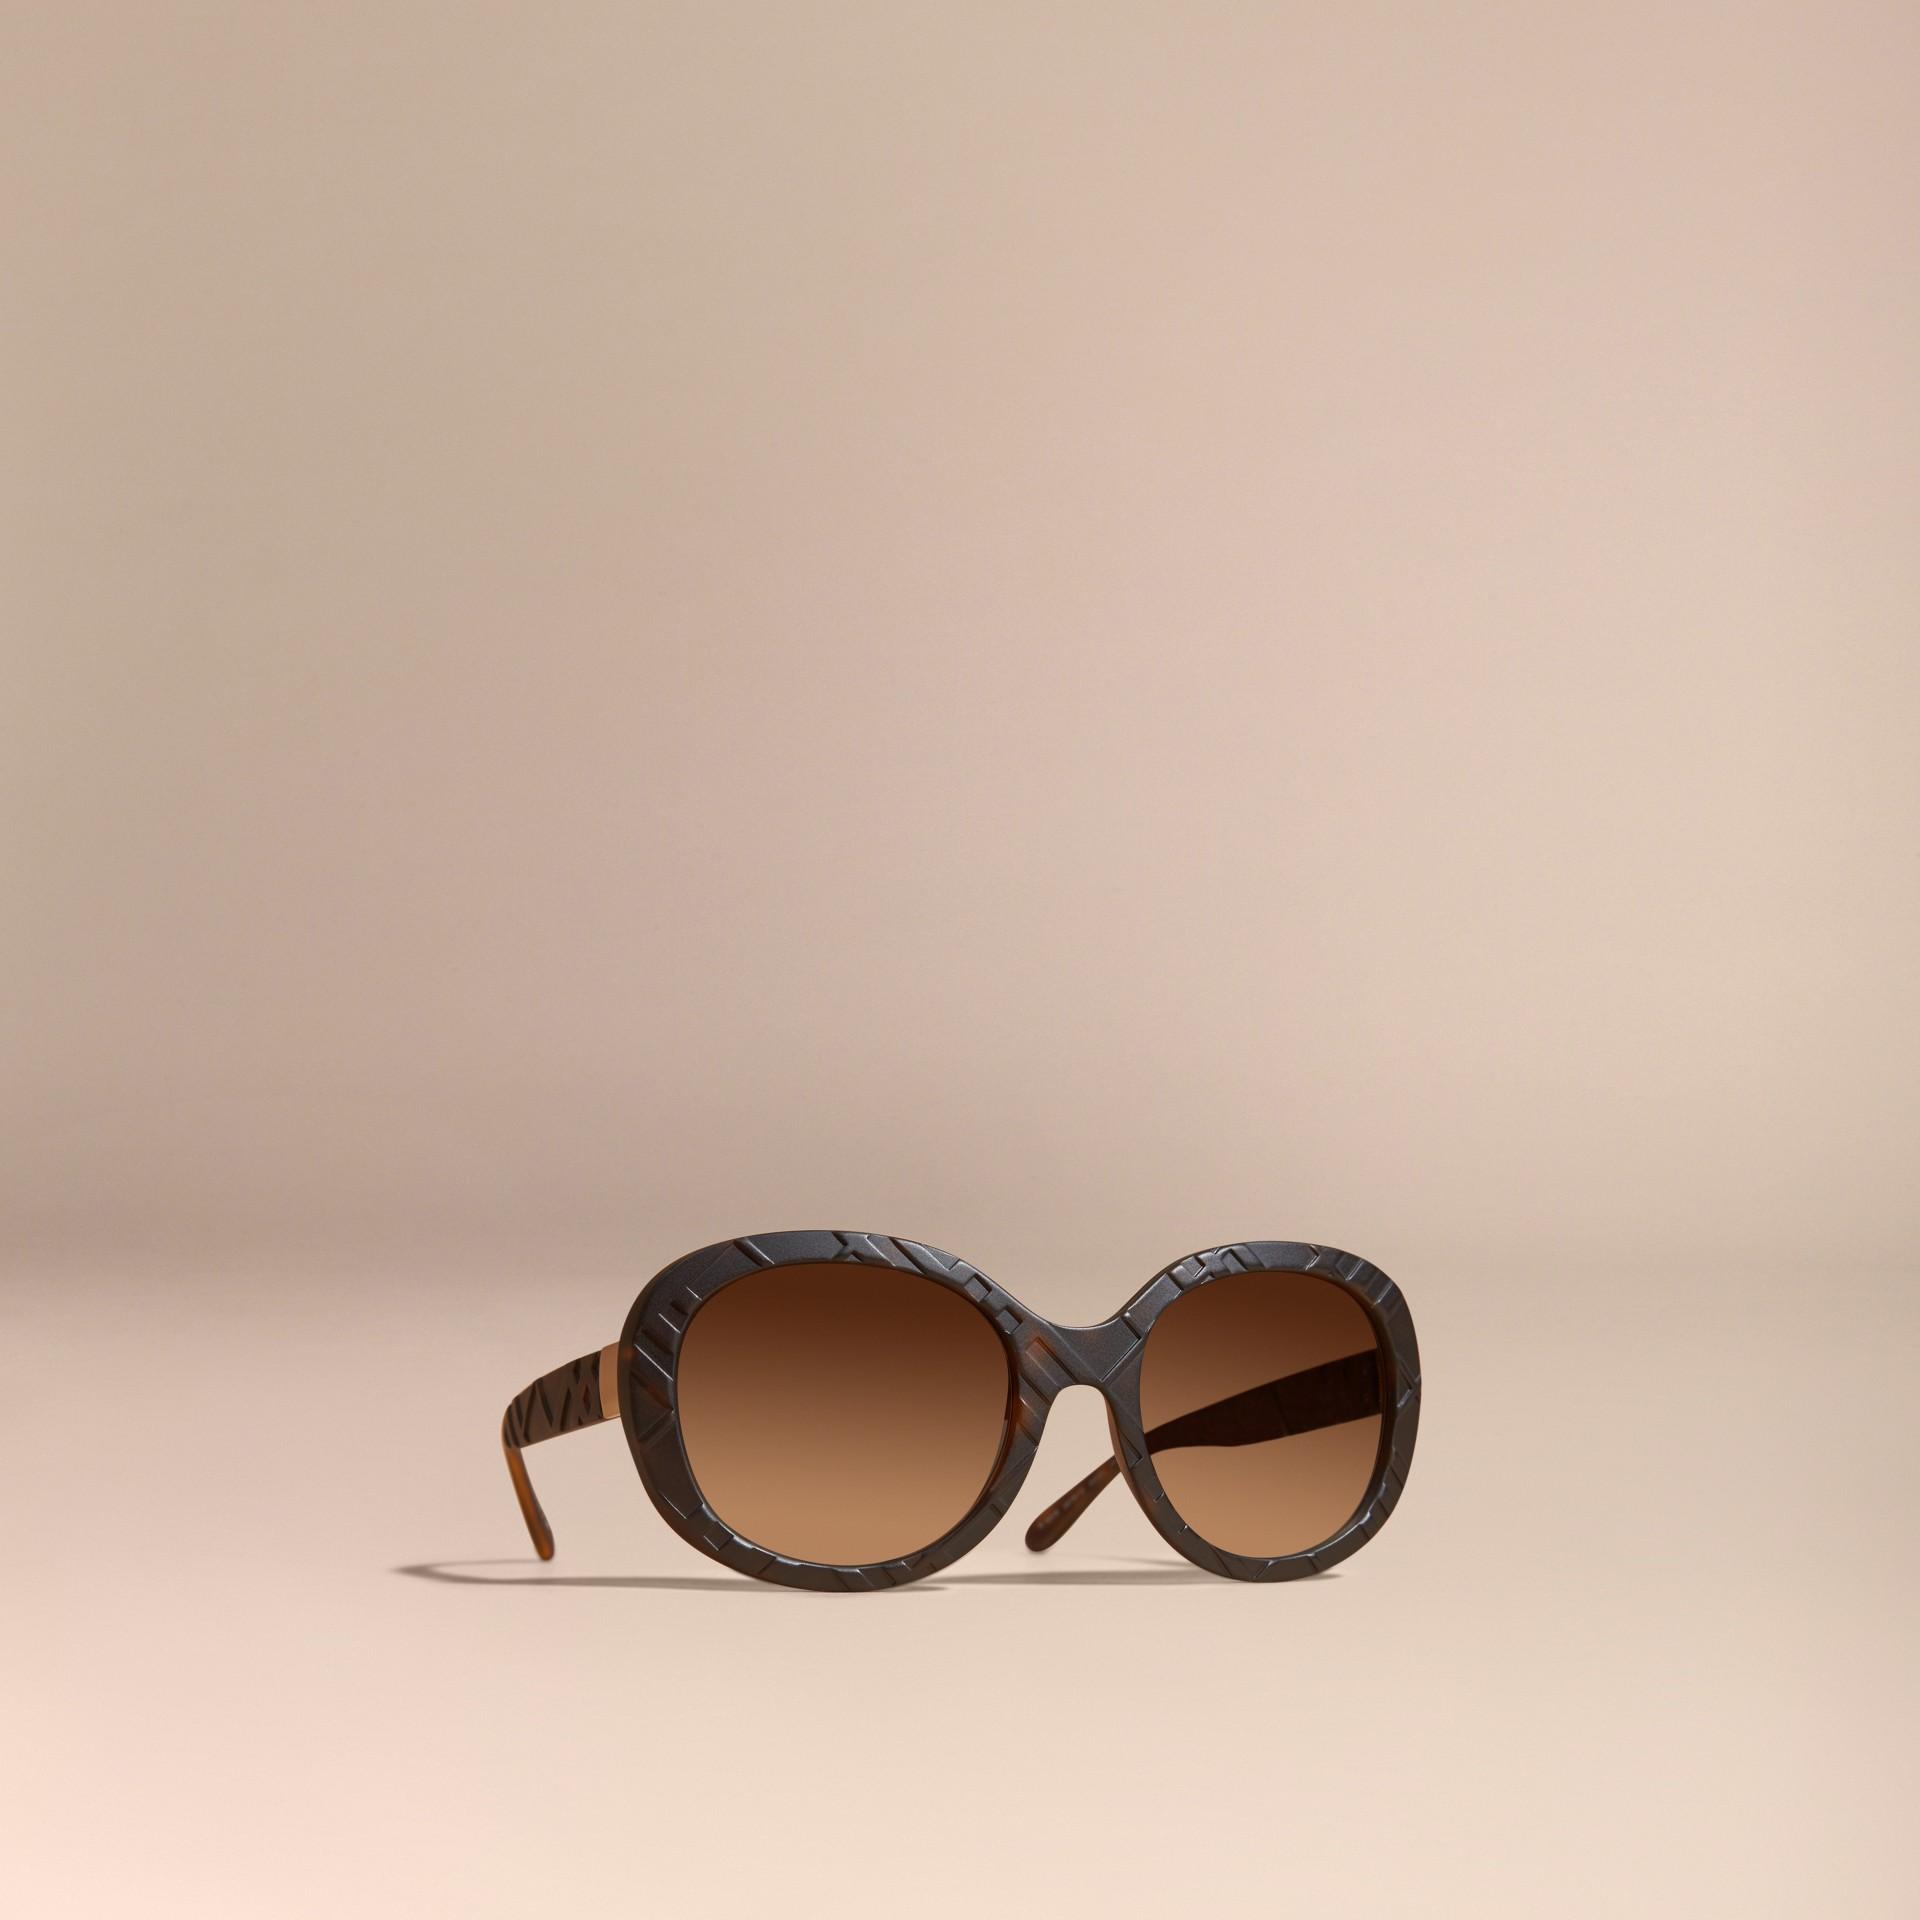 Tortoise shell 3D Check Round Frame Sunglasses Tortoise Shell - gallery image 1